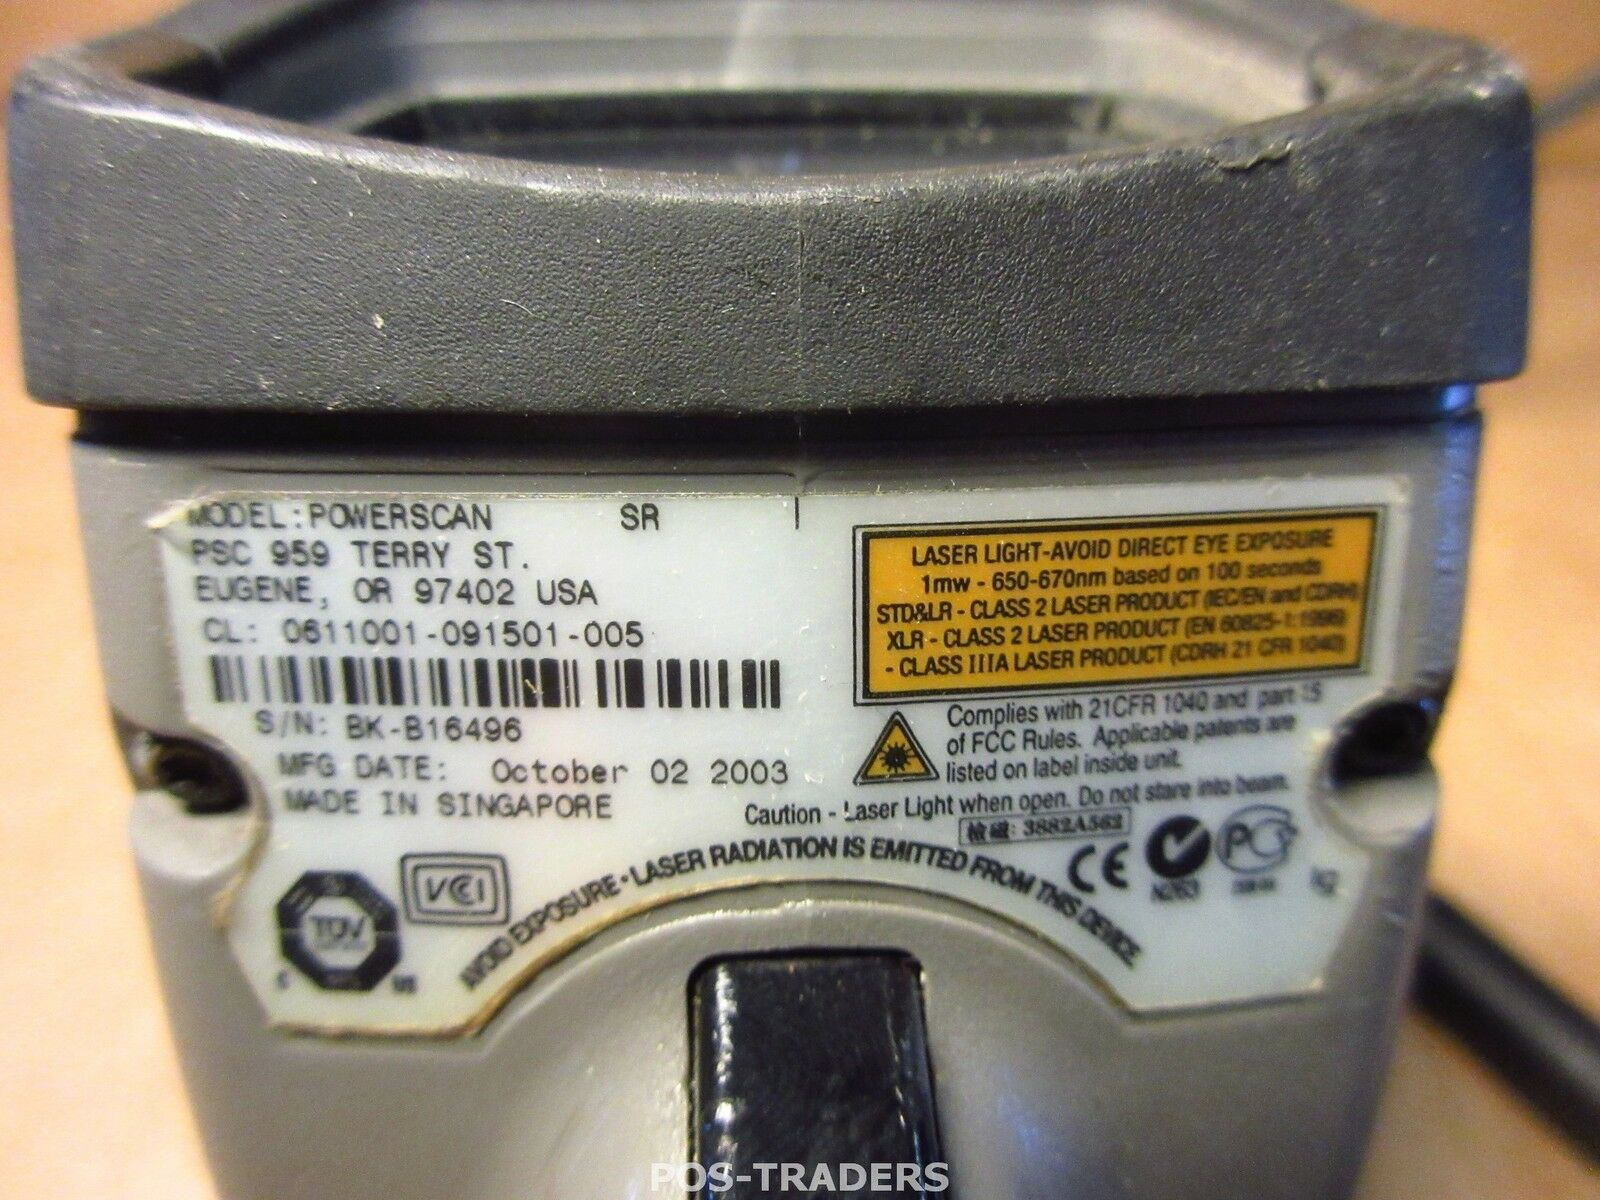 Psc powerscan Sr escáner de código de barras handheld handheld handheld mano escáner Gris-ps/2 cable 0611001 37cbdc